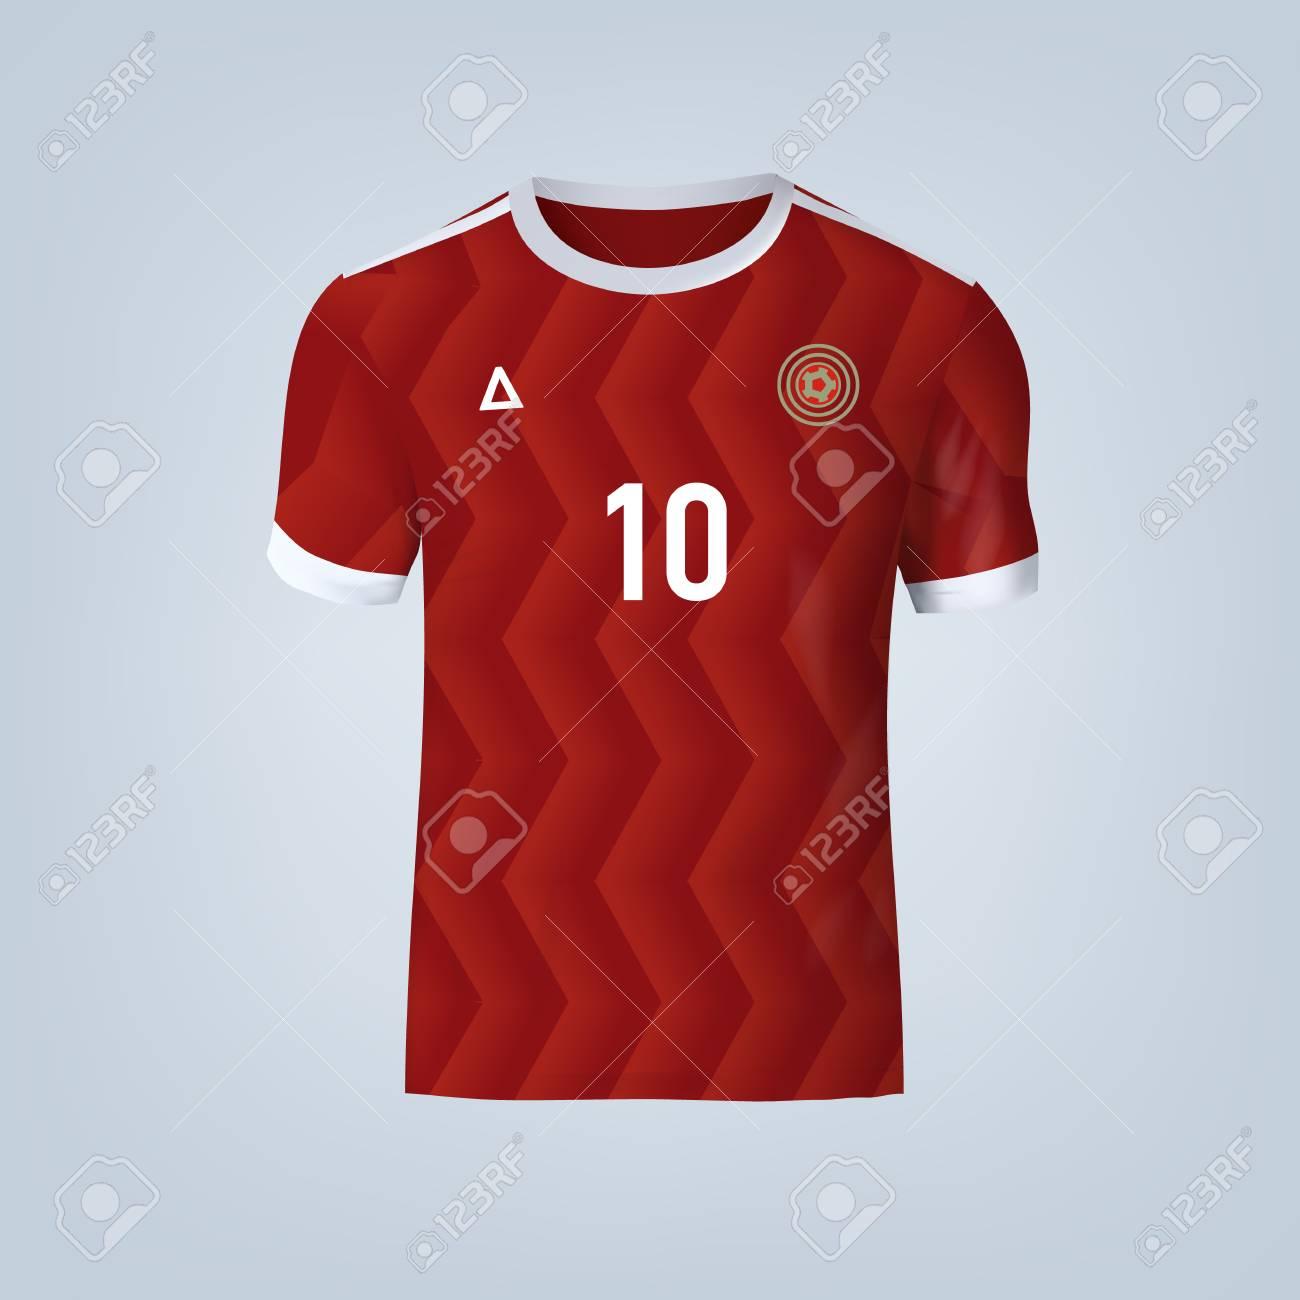 Vector illustration of football t-shirt template. - 84012298